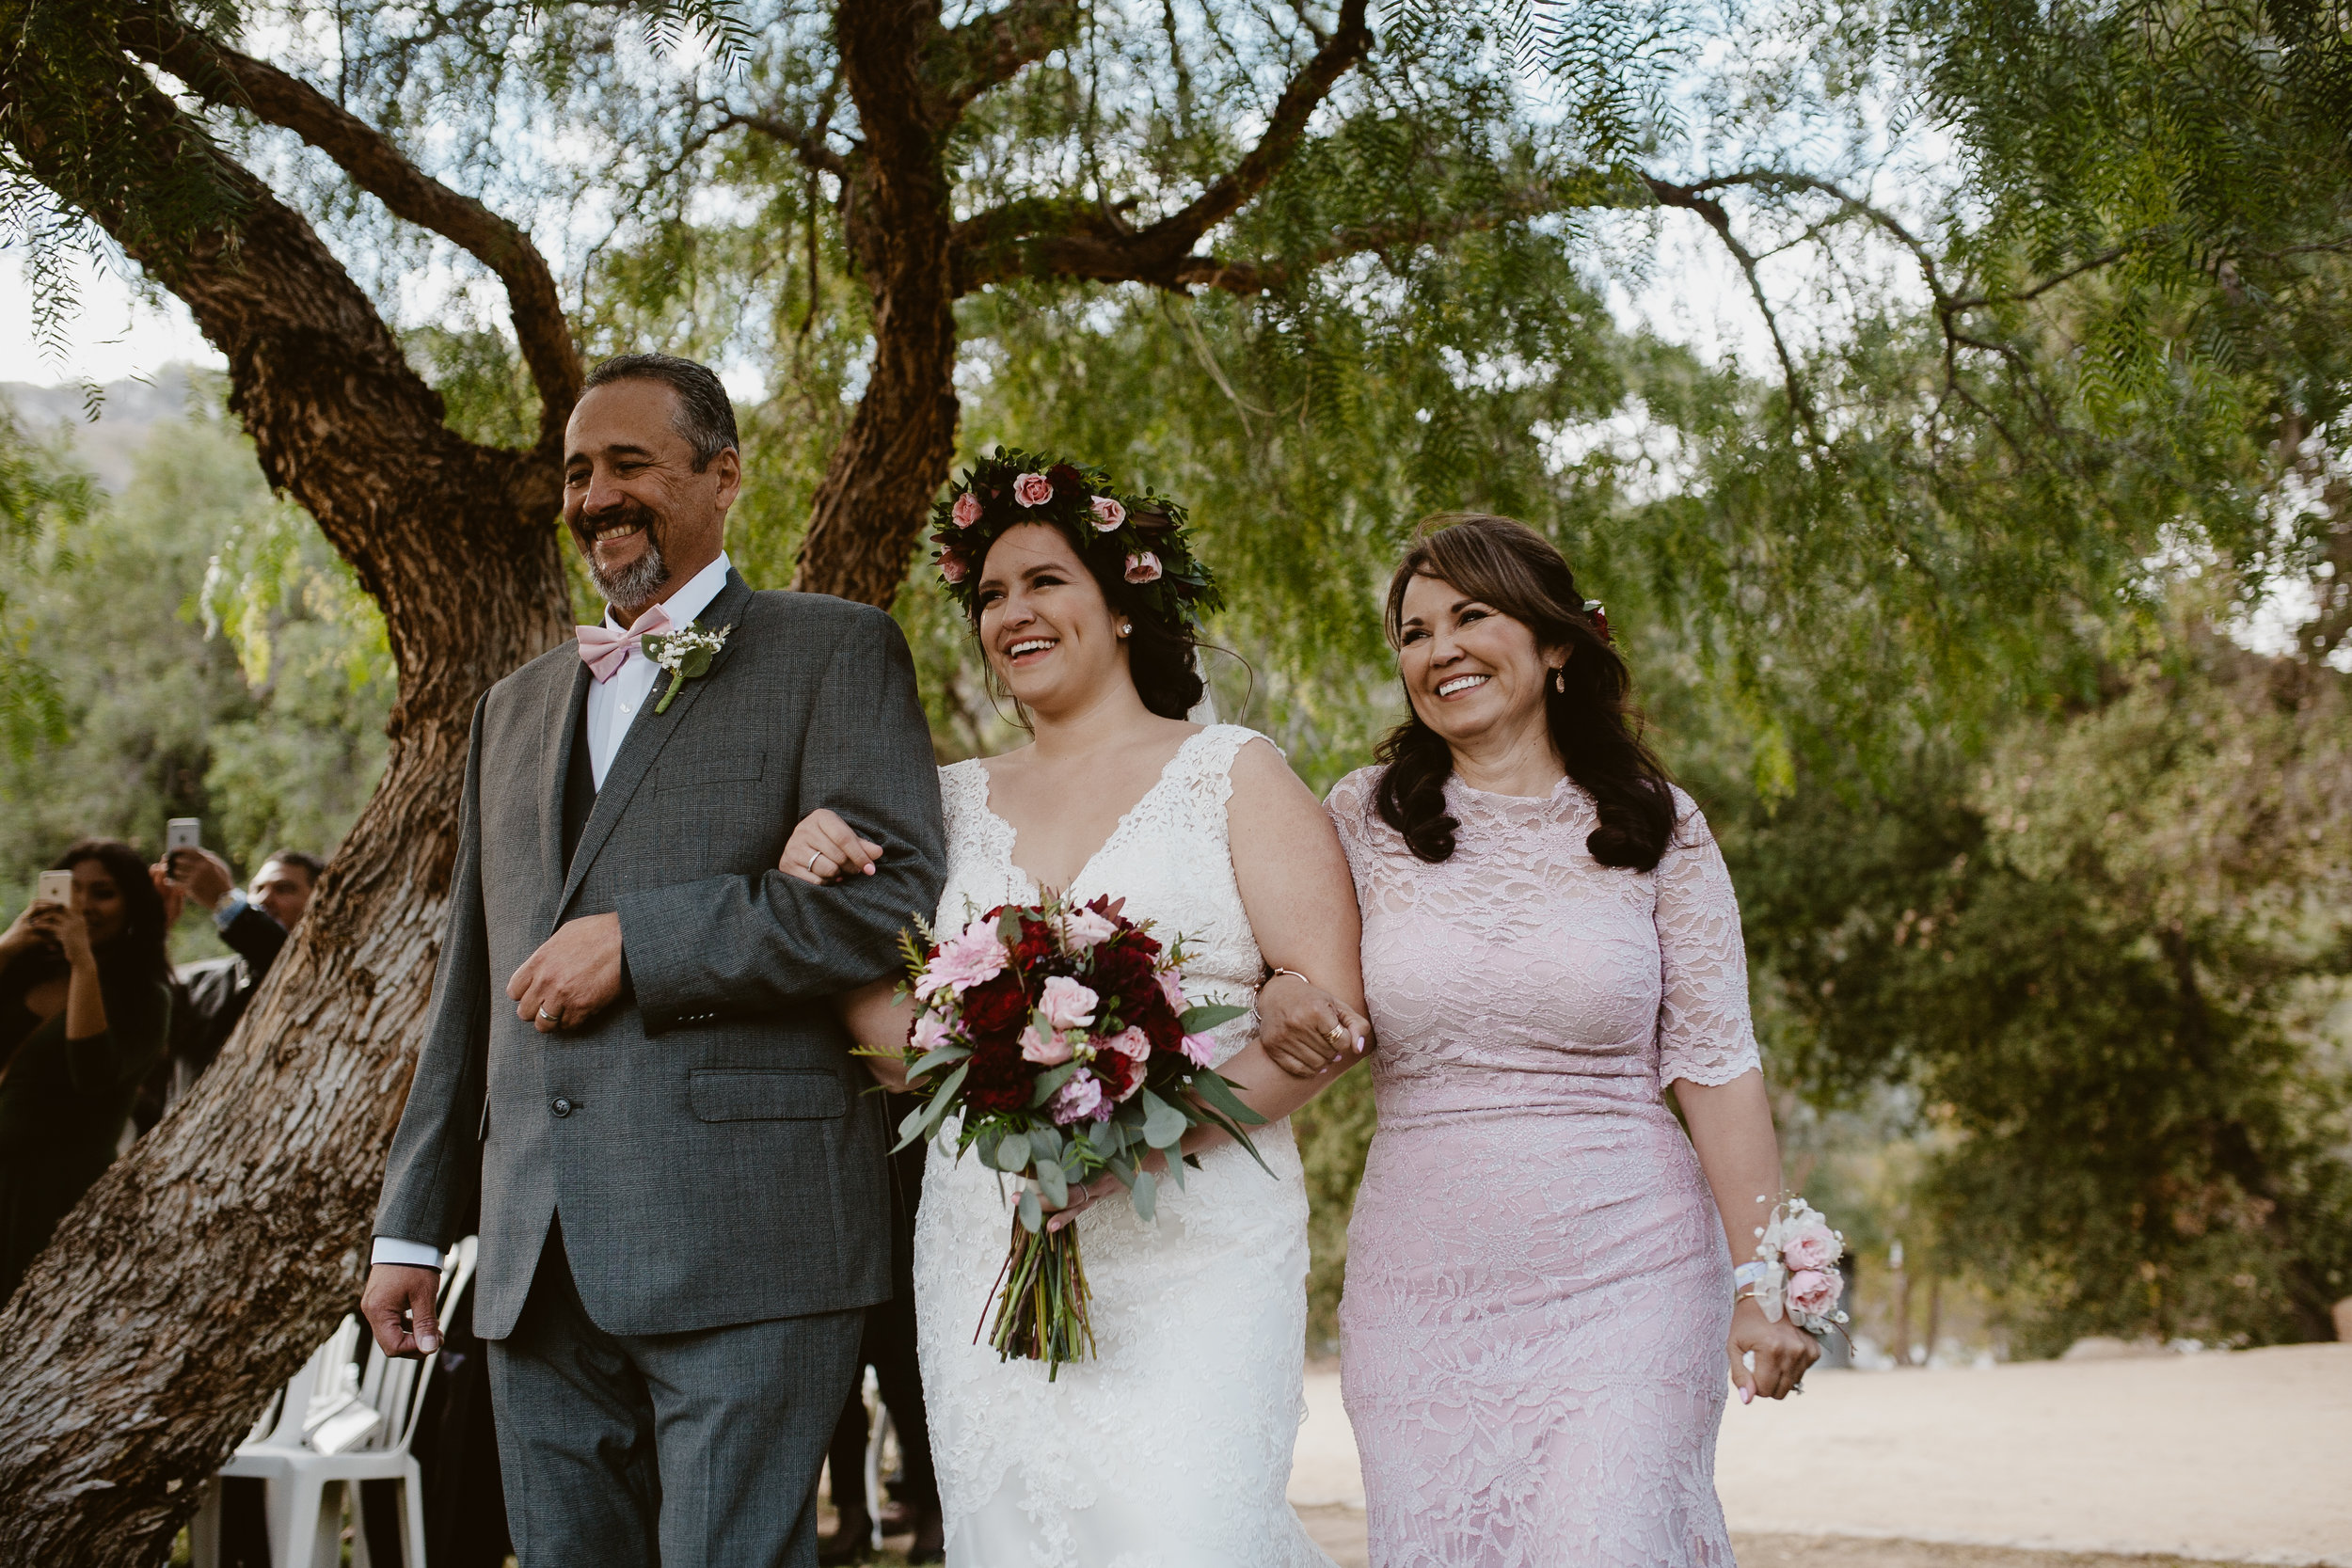 The Bride & her Parents